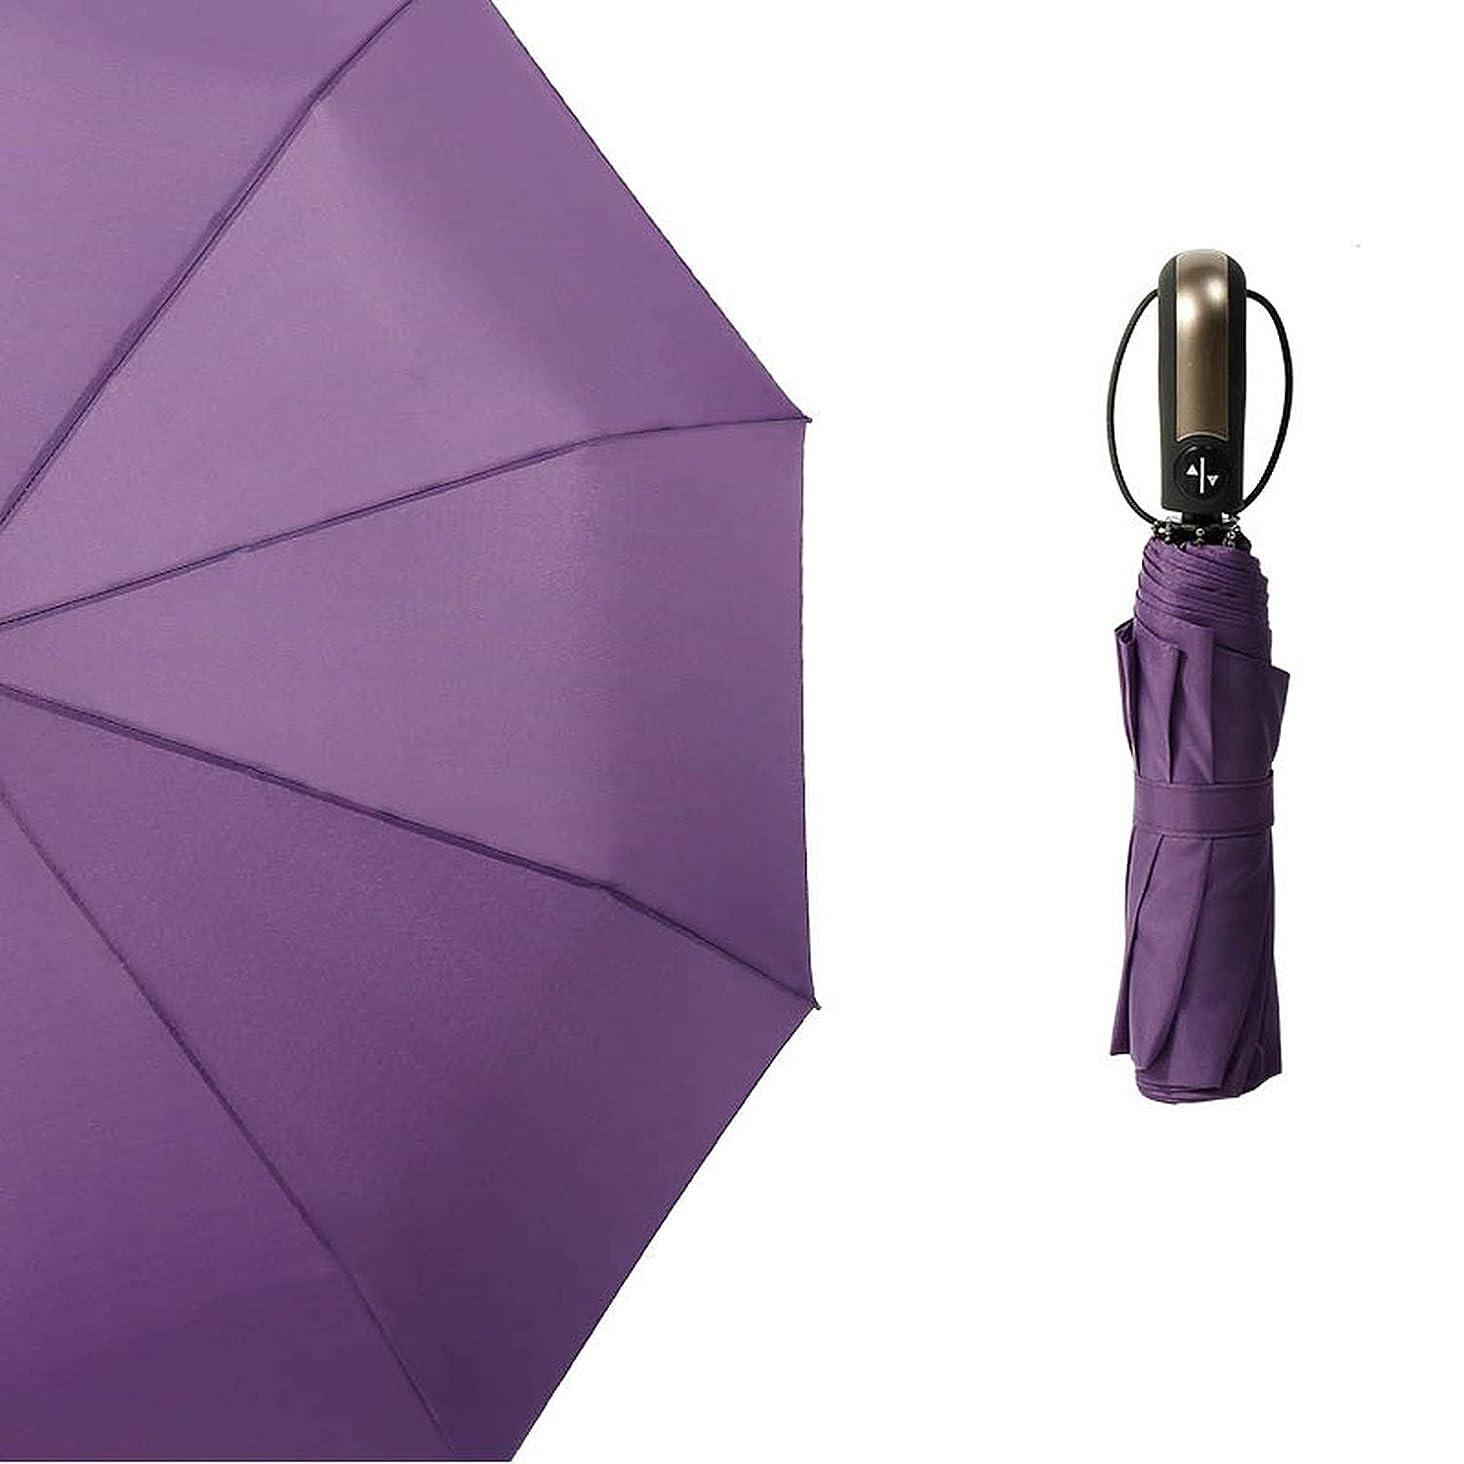 1 Pc Portable Sunny Rainy Umbrella Dual-Purpose Umbrella Windproof 3 Folding 10 Bone Commercial Automatic,Purple